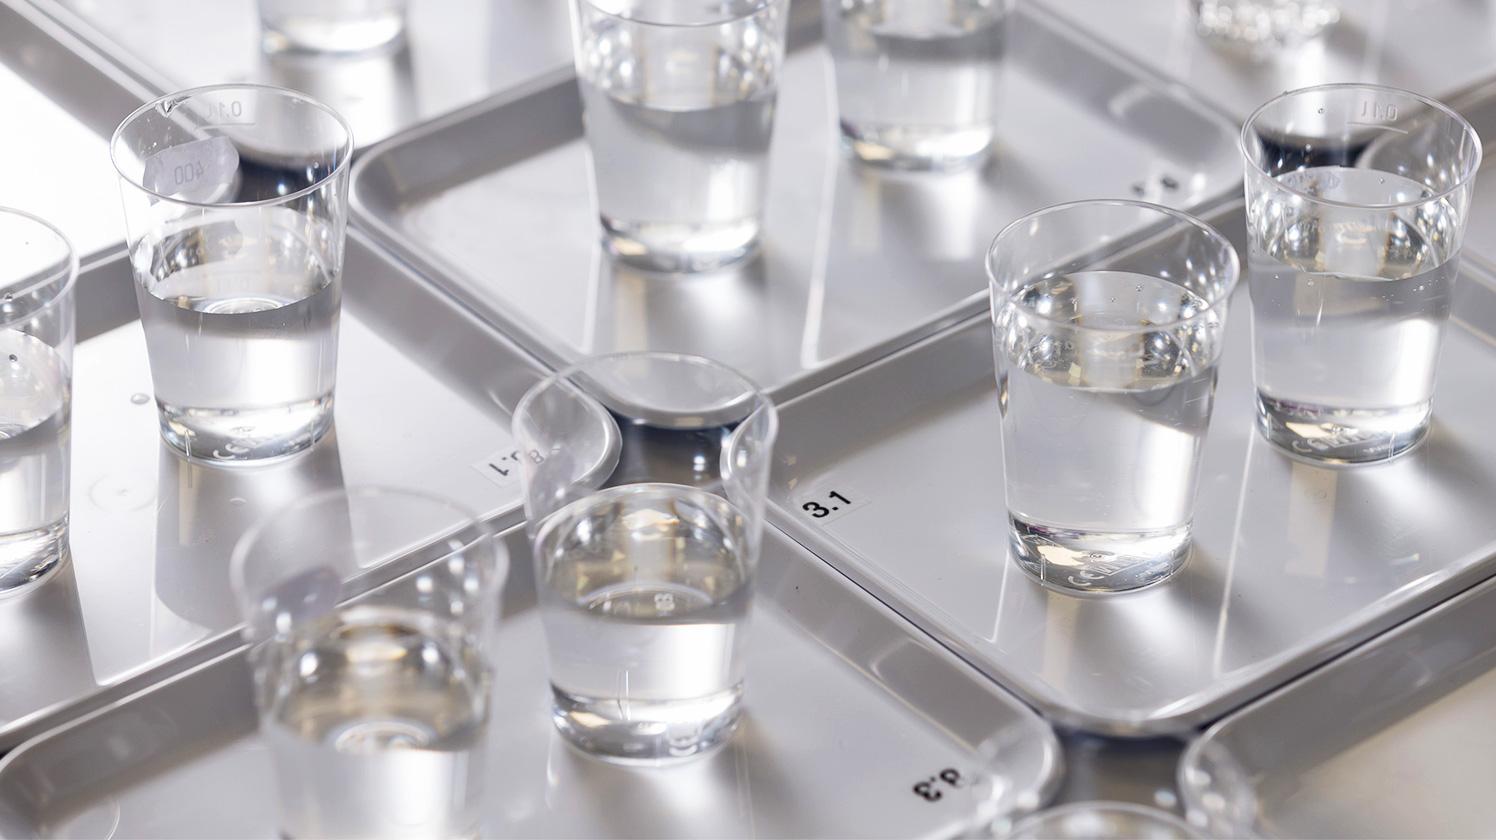 historia firmy BRITA laboratorium optyczne